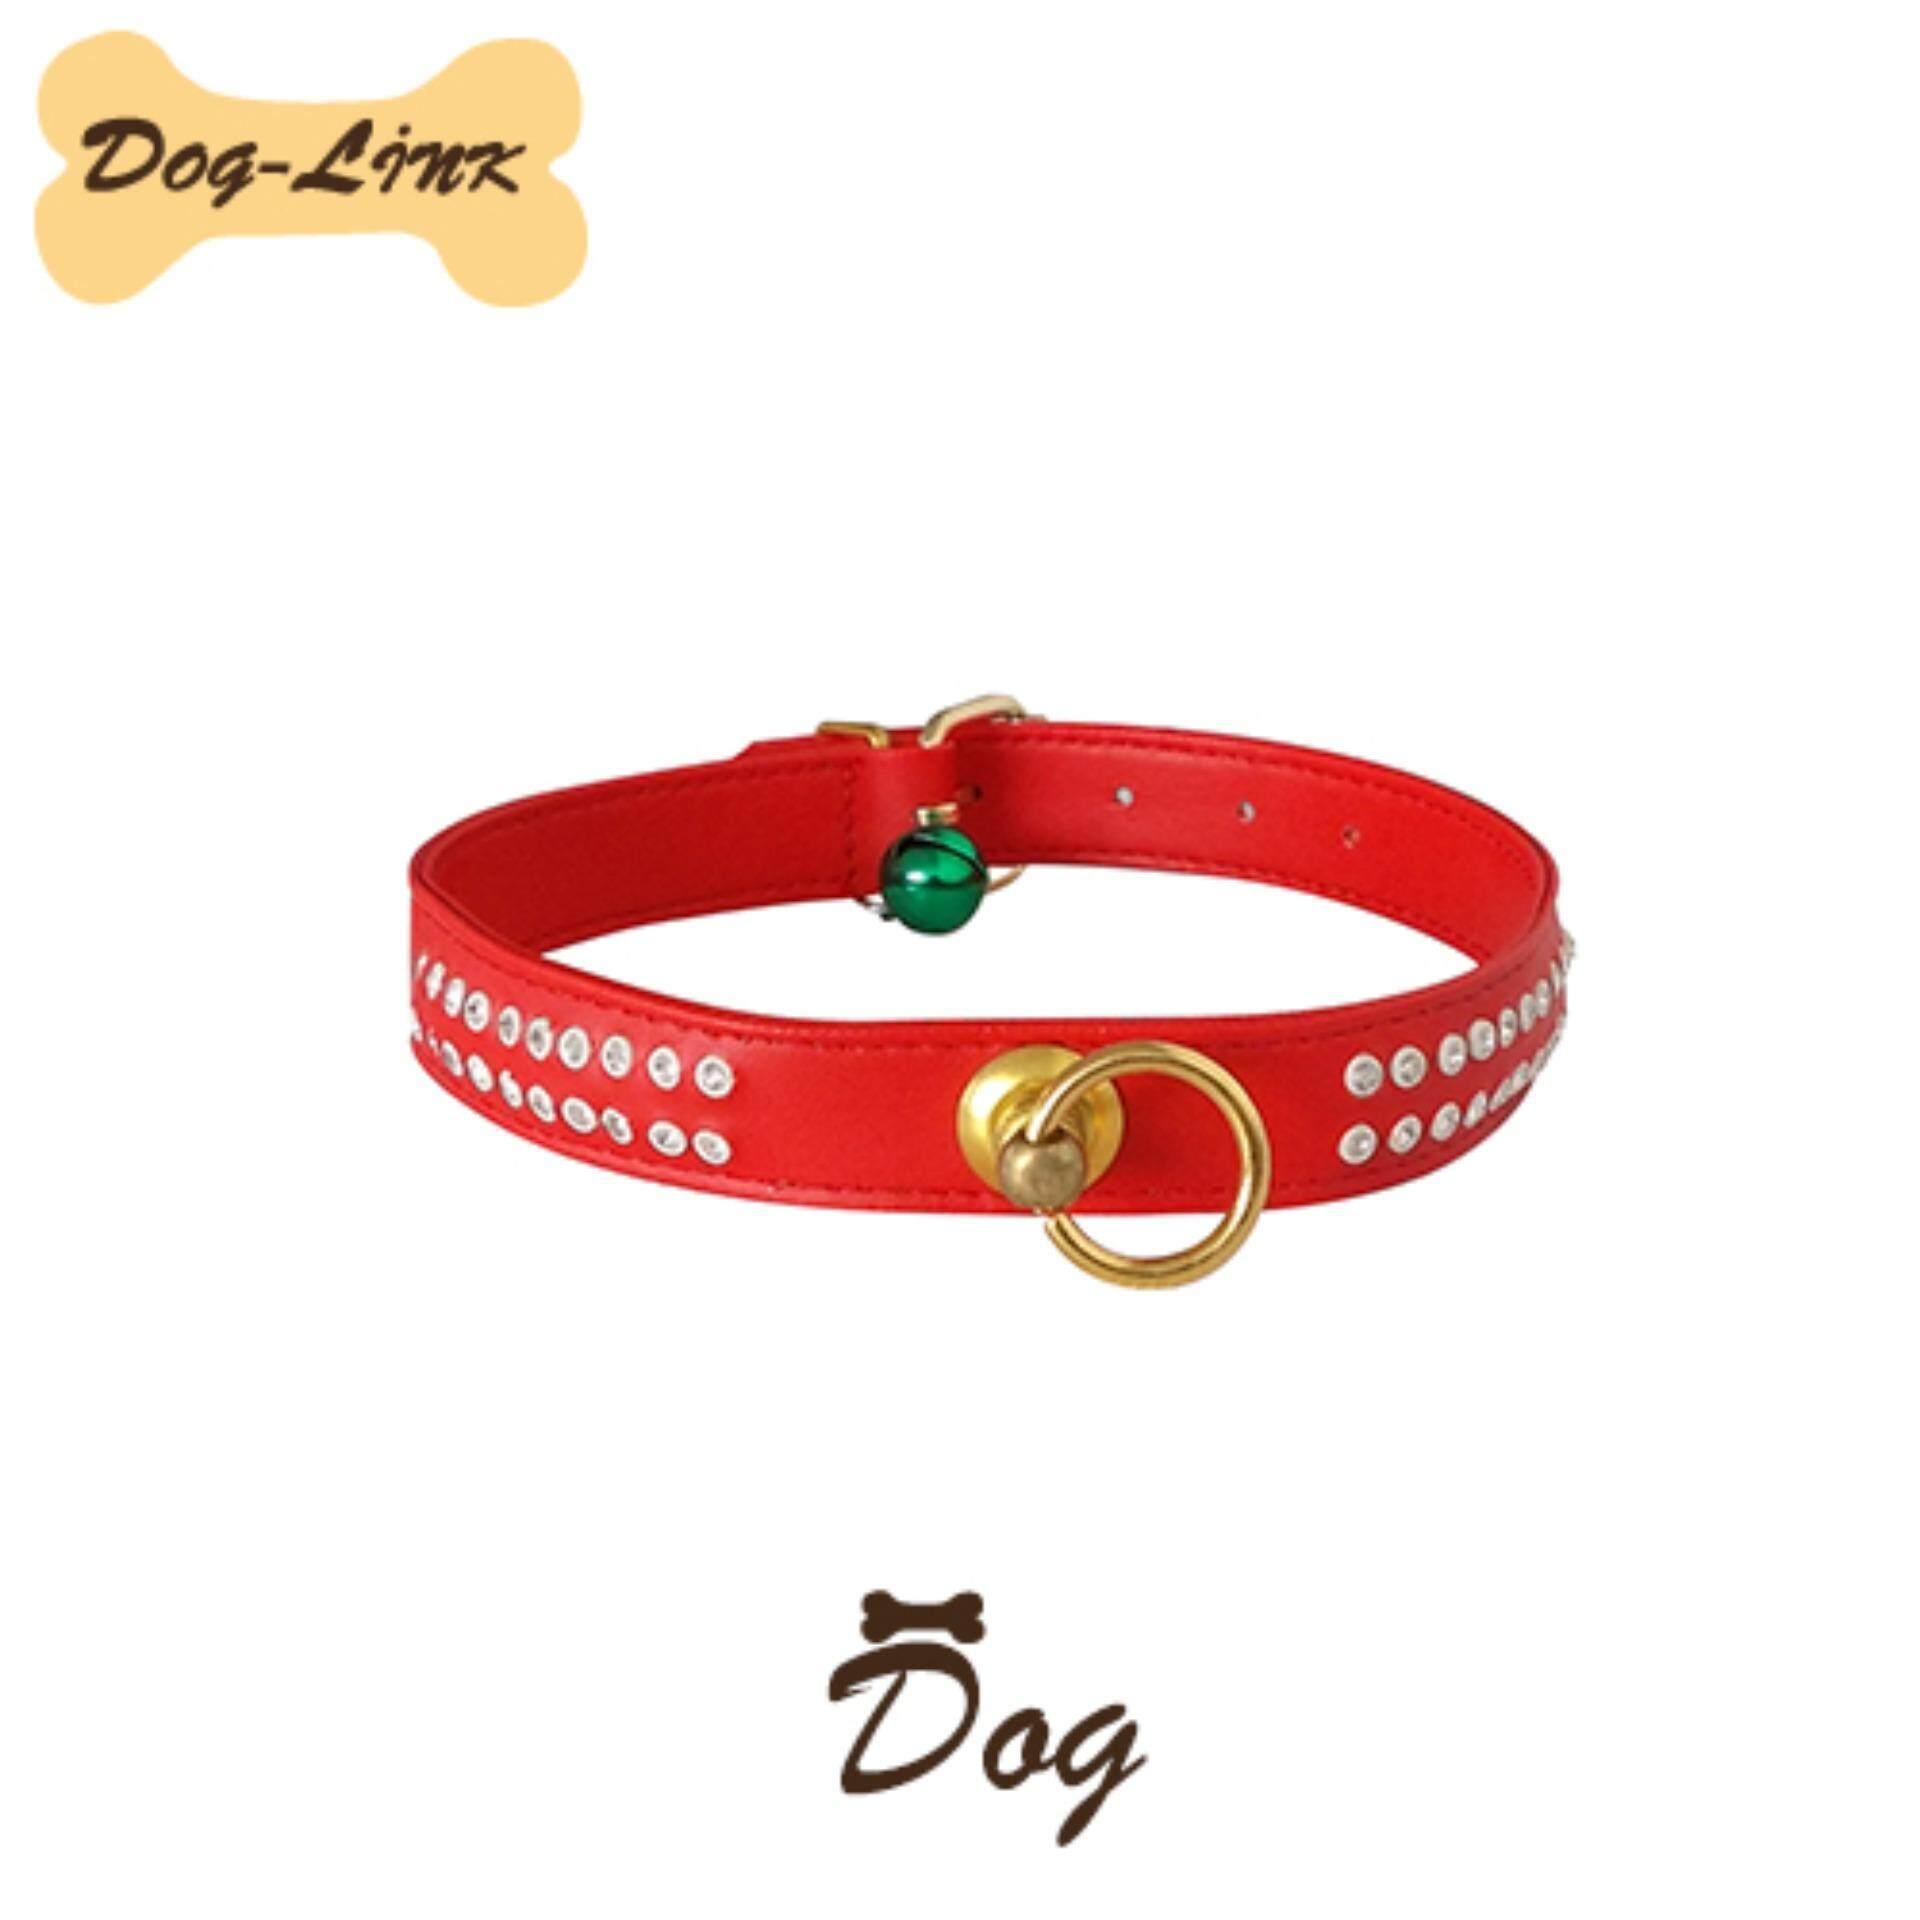 Dog-Link ปลอกคอเพชร 16 mm. สีแดง